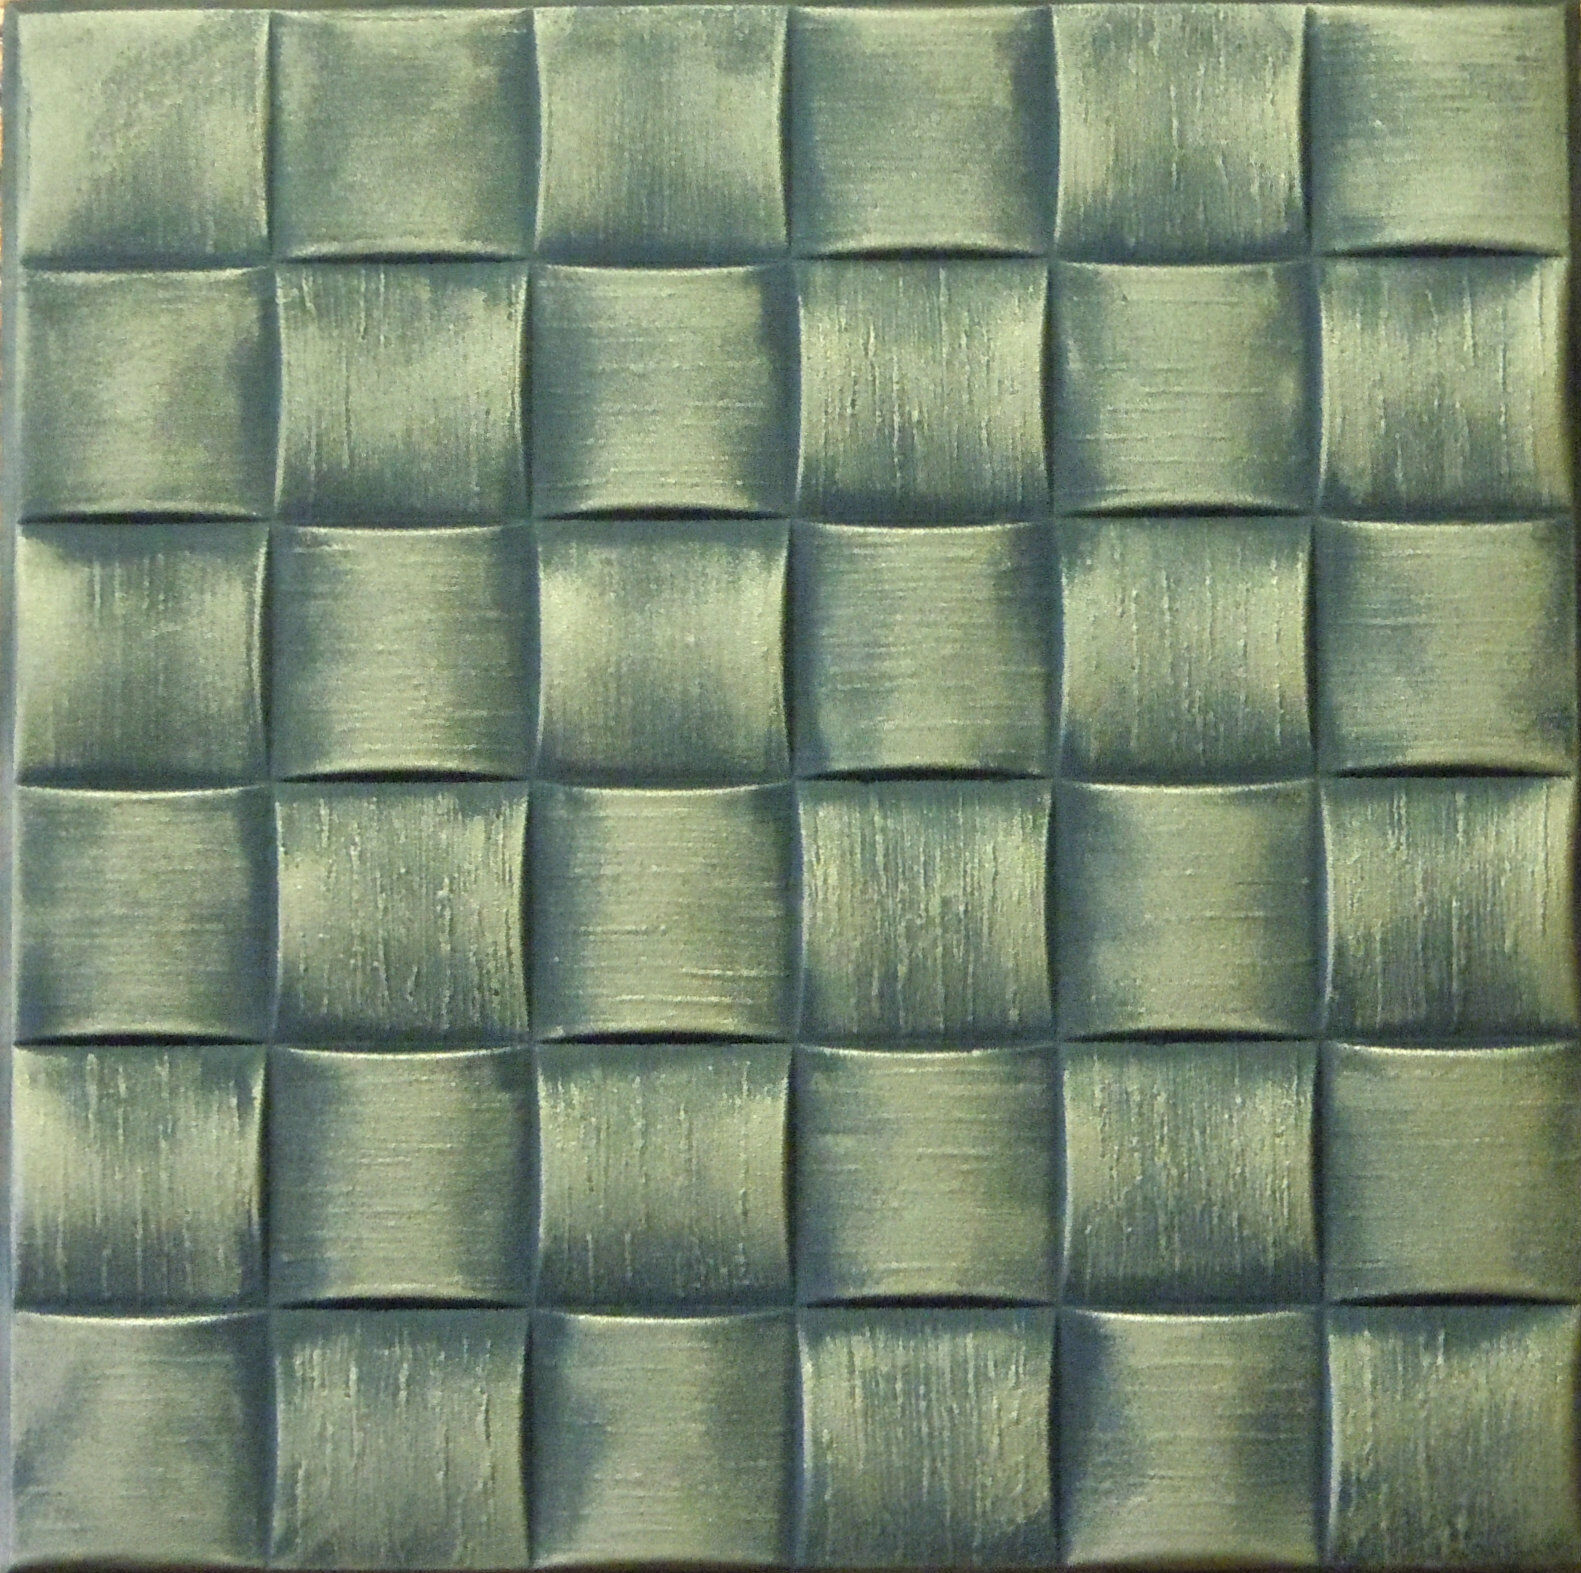 Decorative Texture Ceiling Tiles Glue Up R25 Antique Brass On Ebay